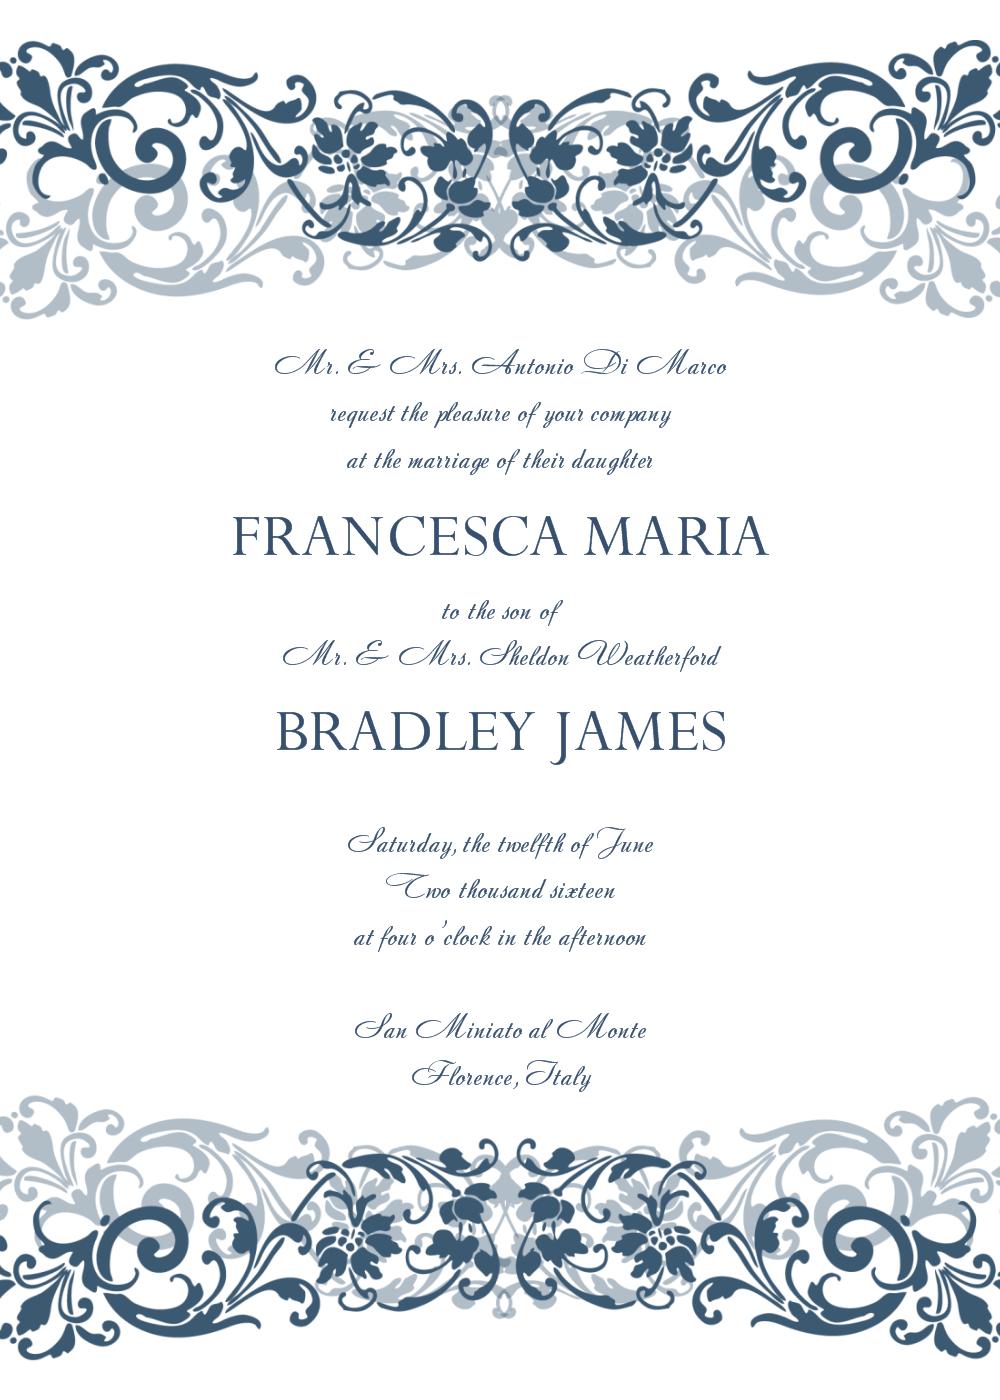 Free Wedding Invitation Templates For Word | Wedding Invitation - Free Printable Wedding Invitation Templates